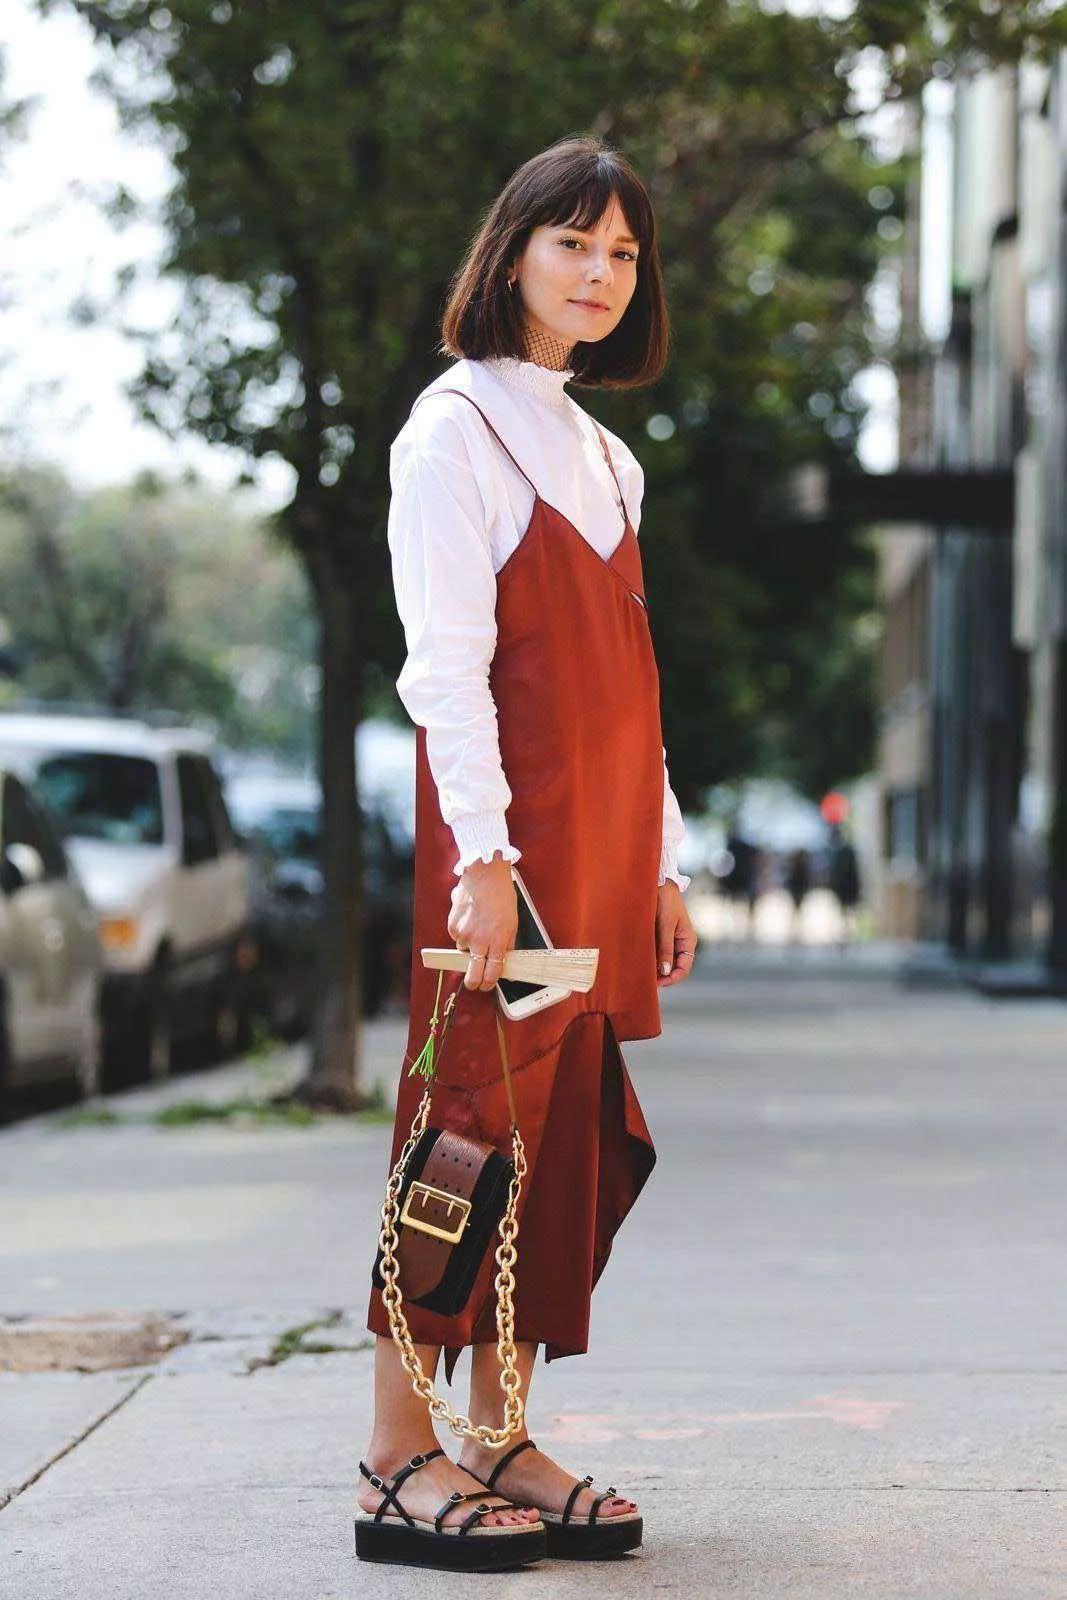 fb6113e0412 Πώς μπορείς να φορέσεις τα πέδιλα σου το Φθινόπωρο; | elenifourli.com